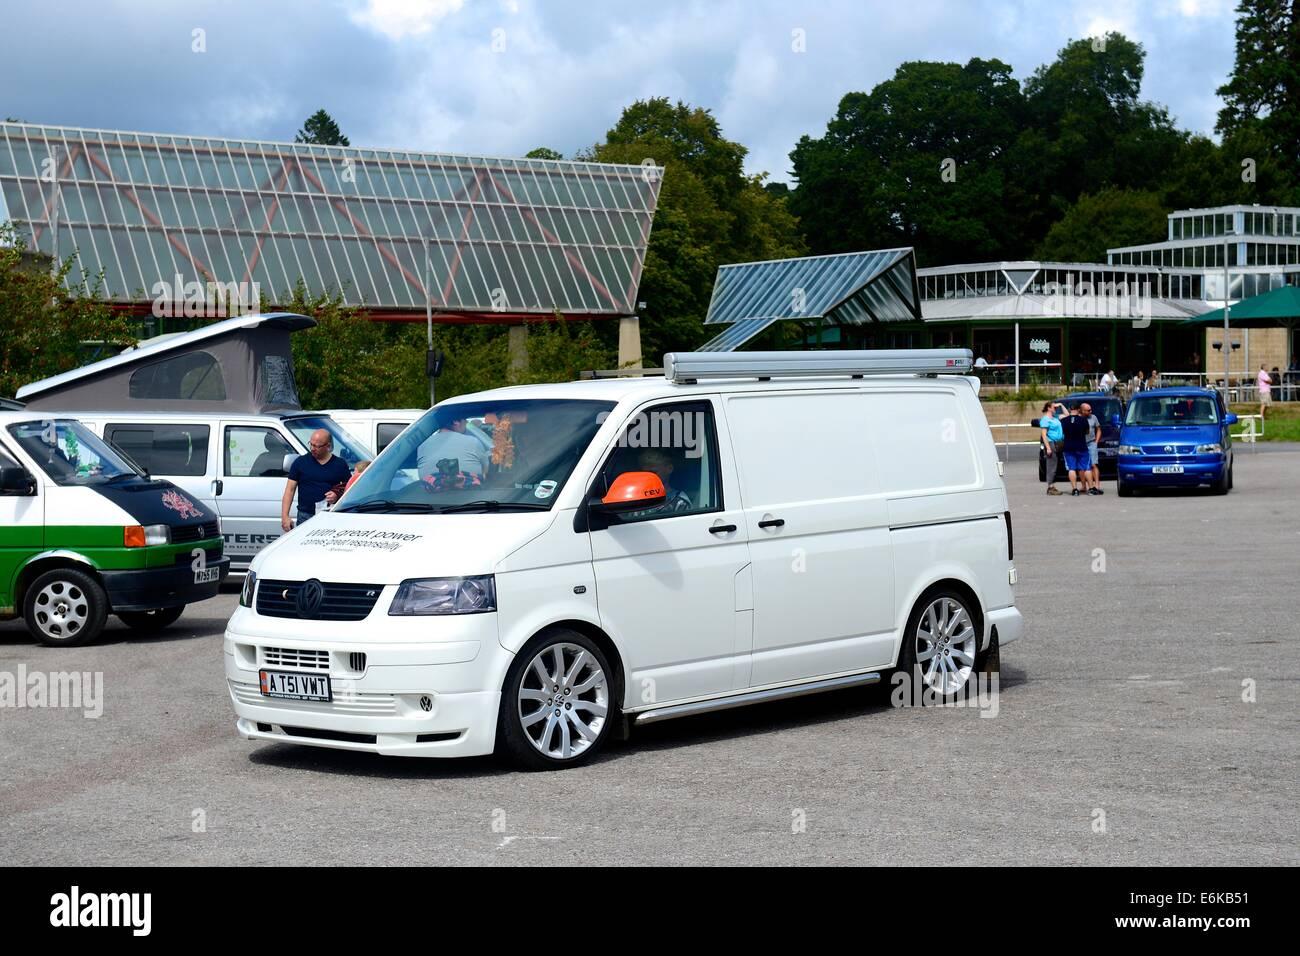 Volkswagen Transporter im National Motor Museum in Beaulieu, Hampshire. 17.08.2014 Stockbild